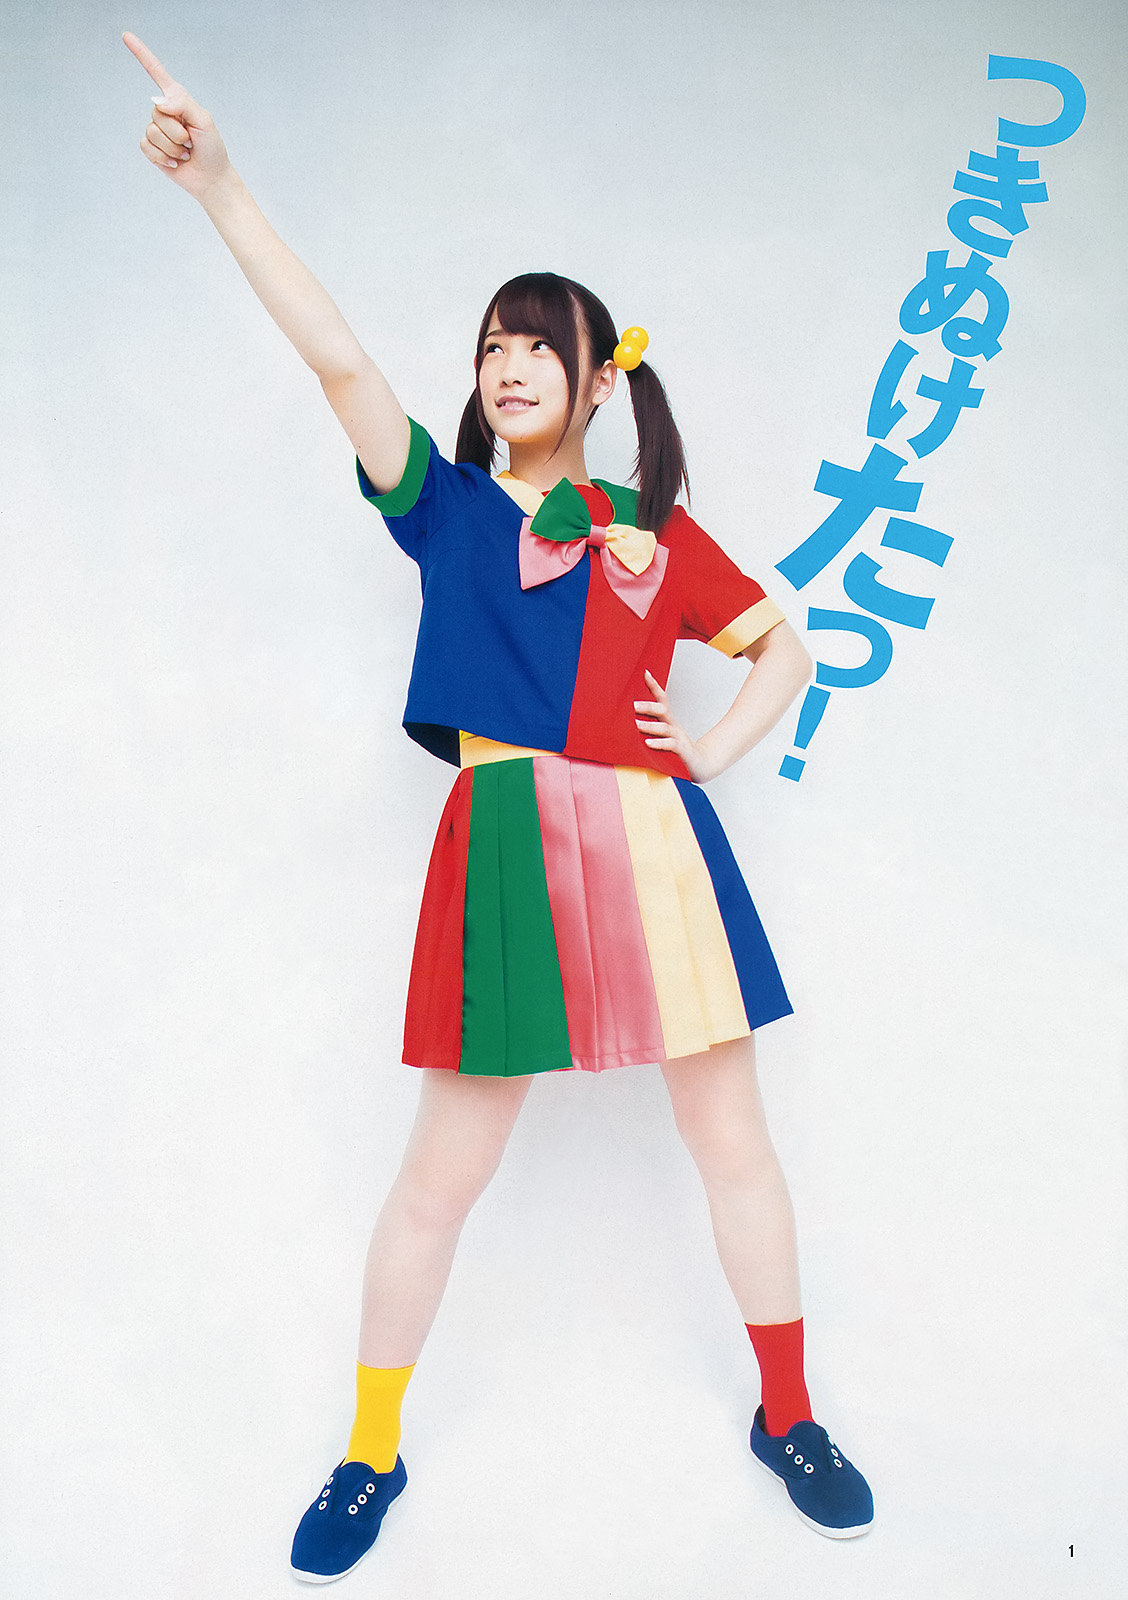 Kawaei Rina Magazine Picture Board Helloonline